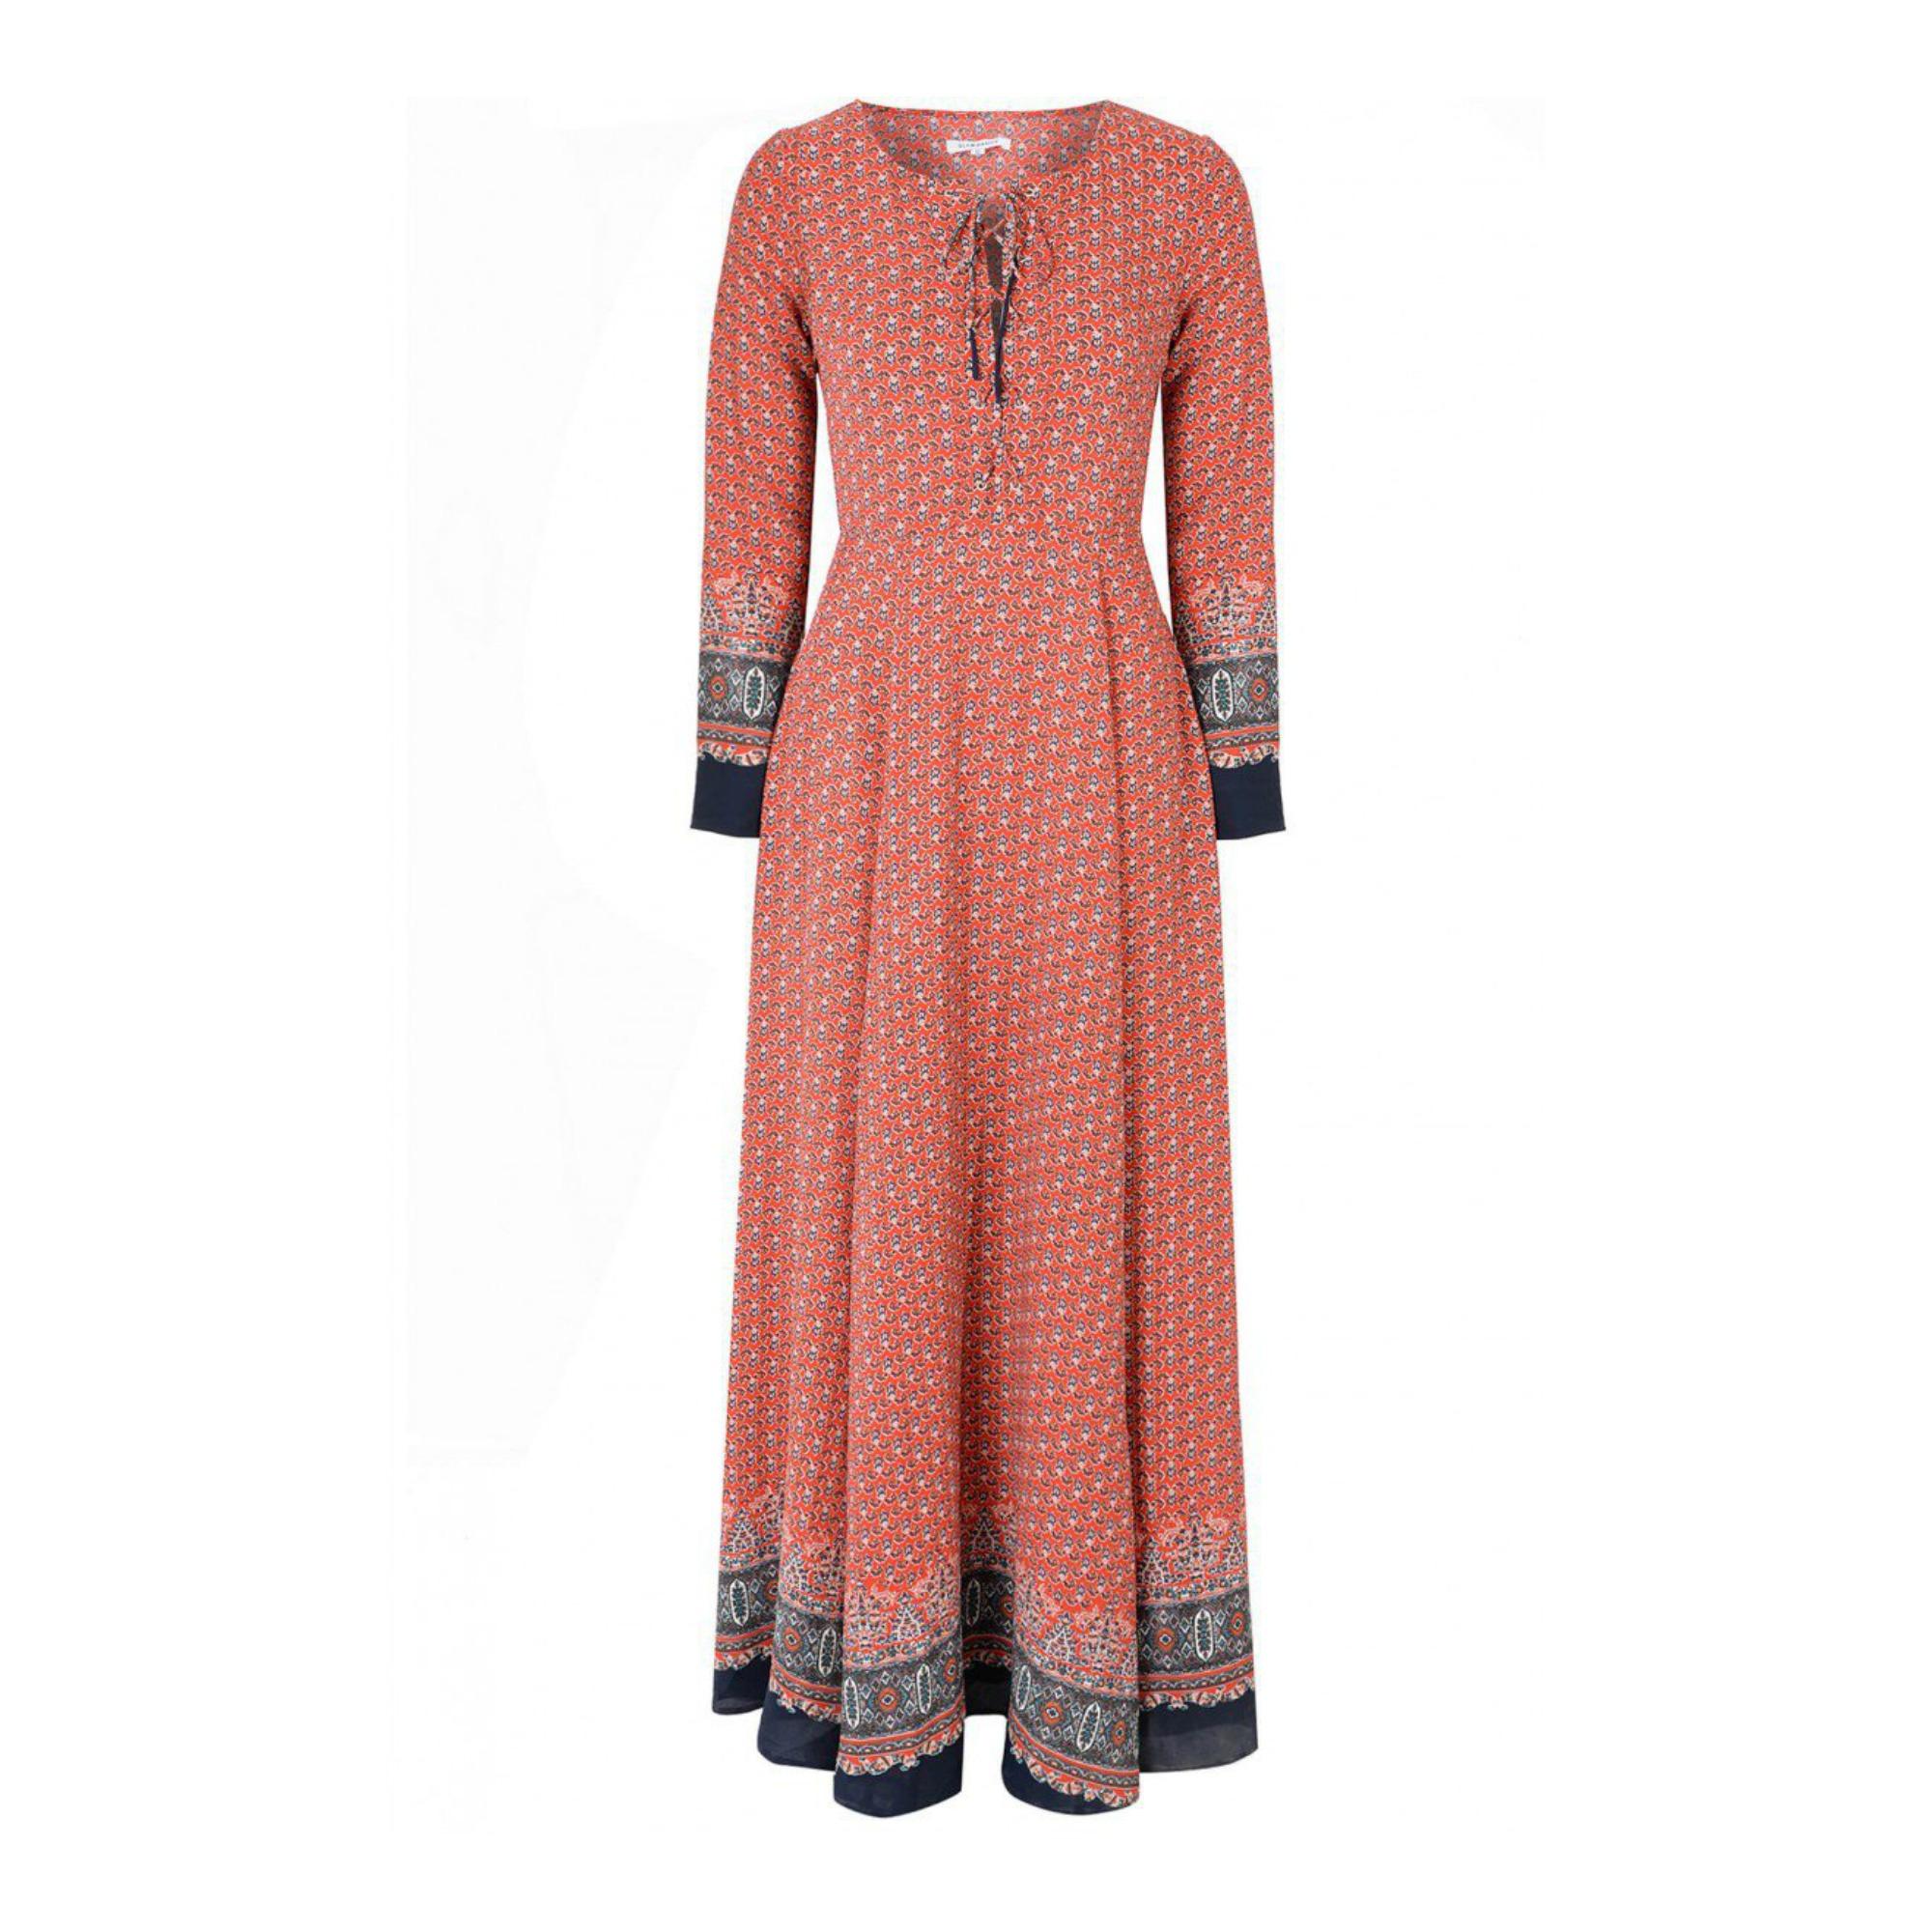 Glamorous Red & Navy Maxi Dress · Kate Middleton Style Blog